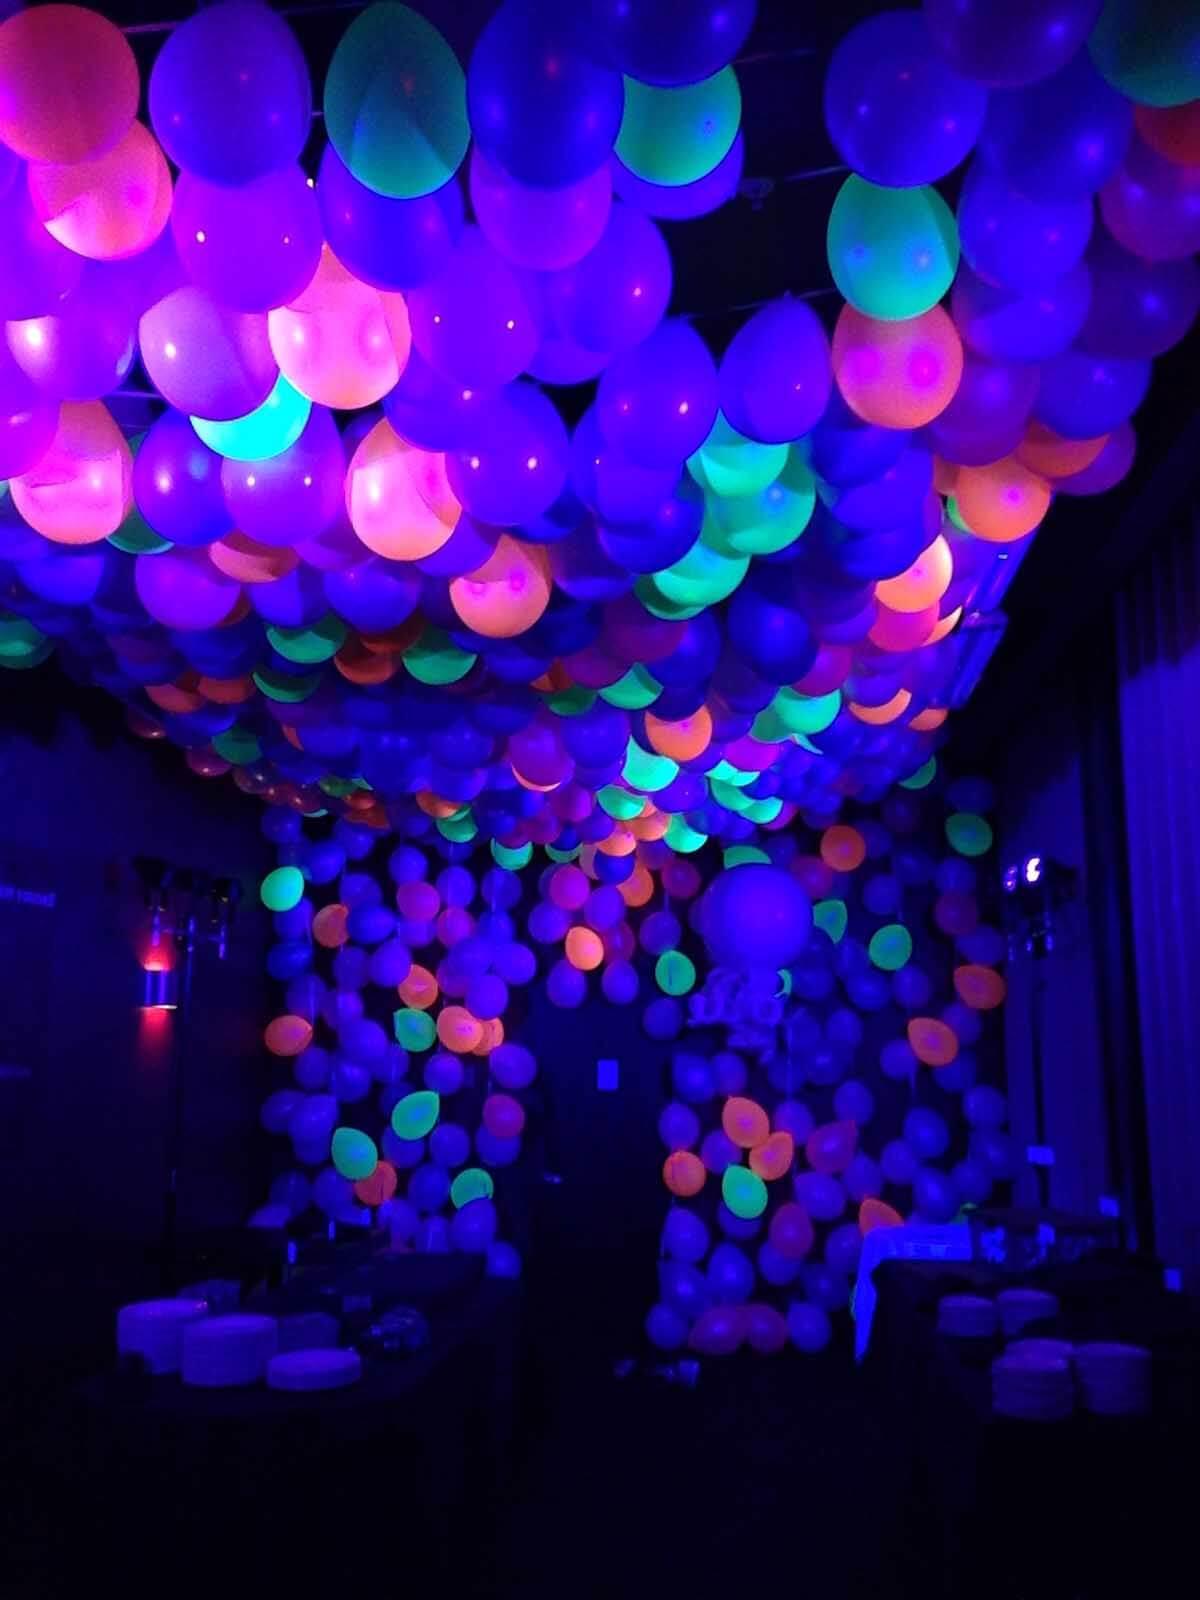 36 Glow in the Dark Star Balloons Cosmic Birthday Party Glow in the Dark Confetti Balloons